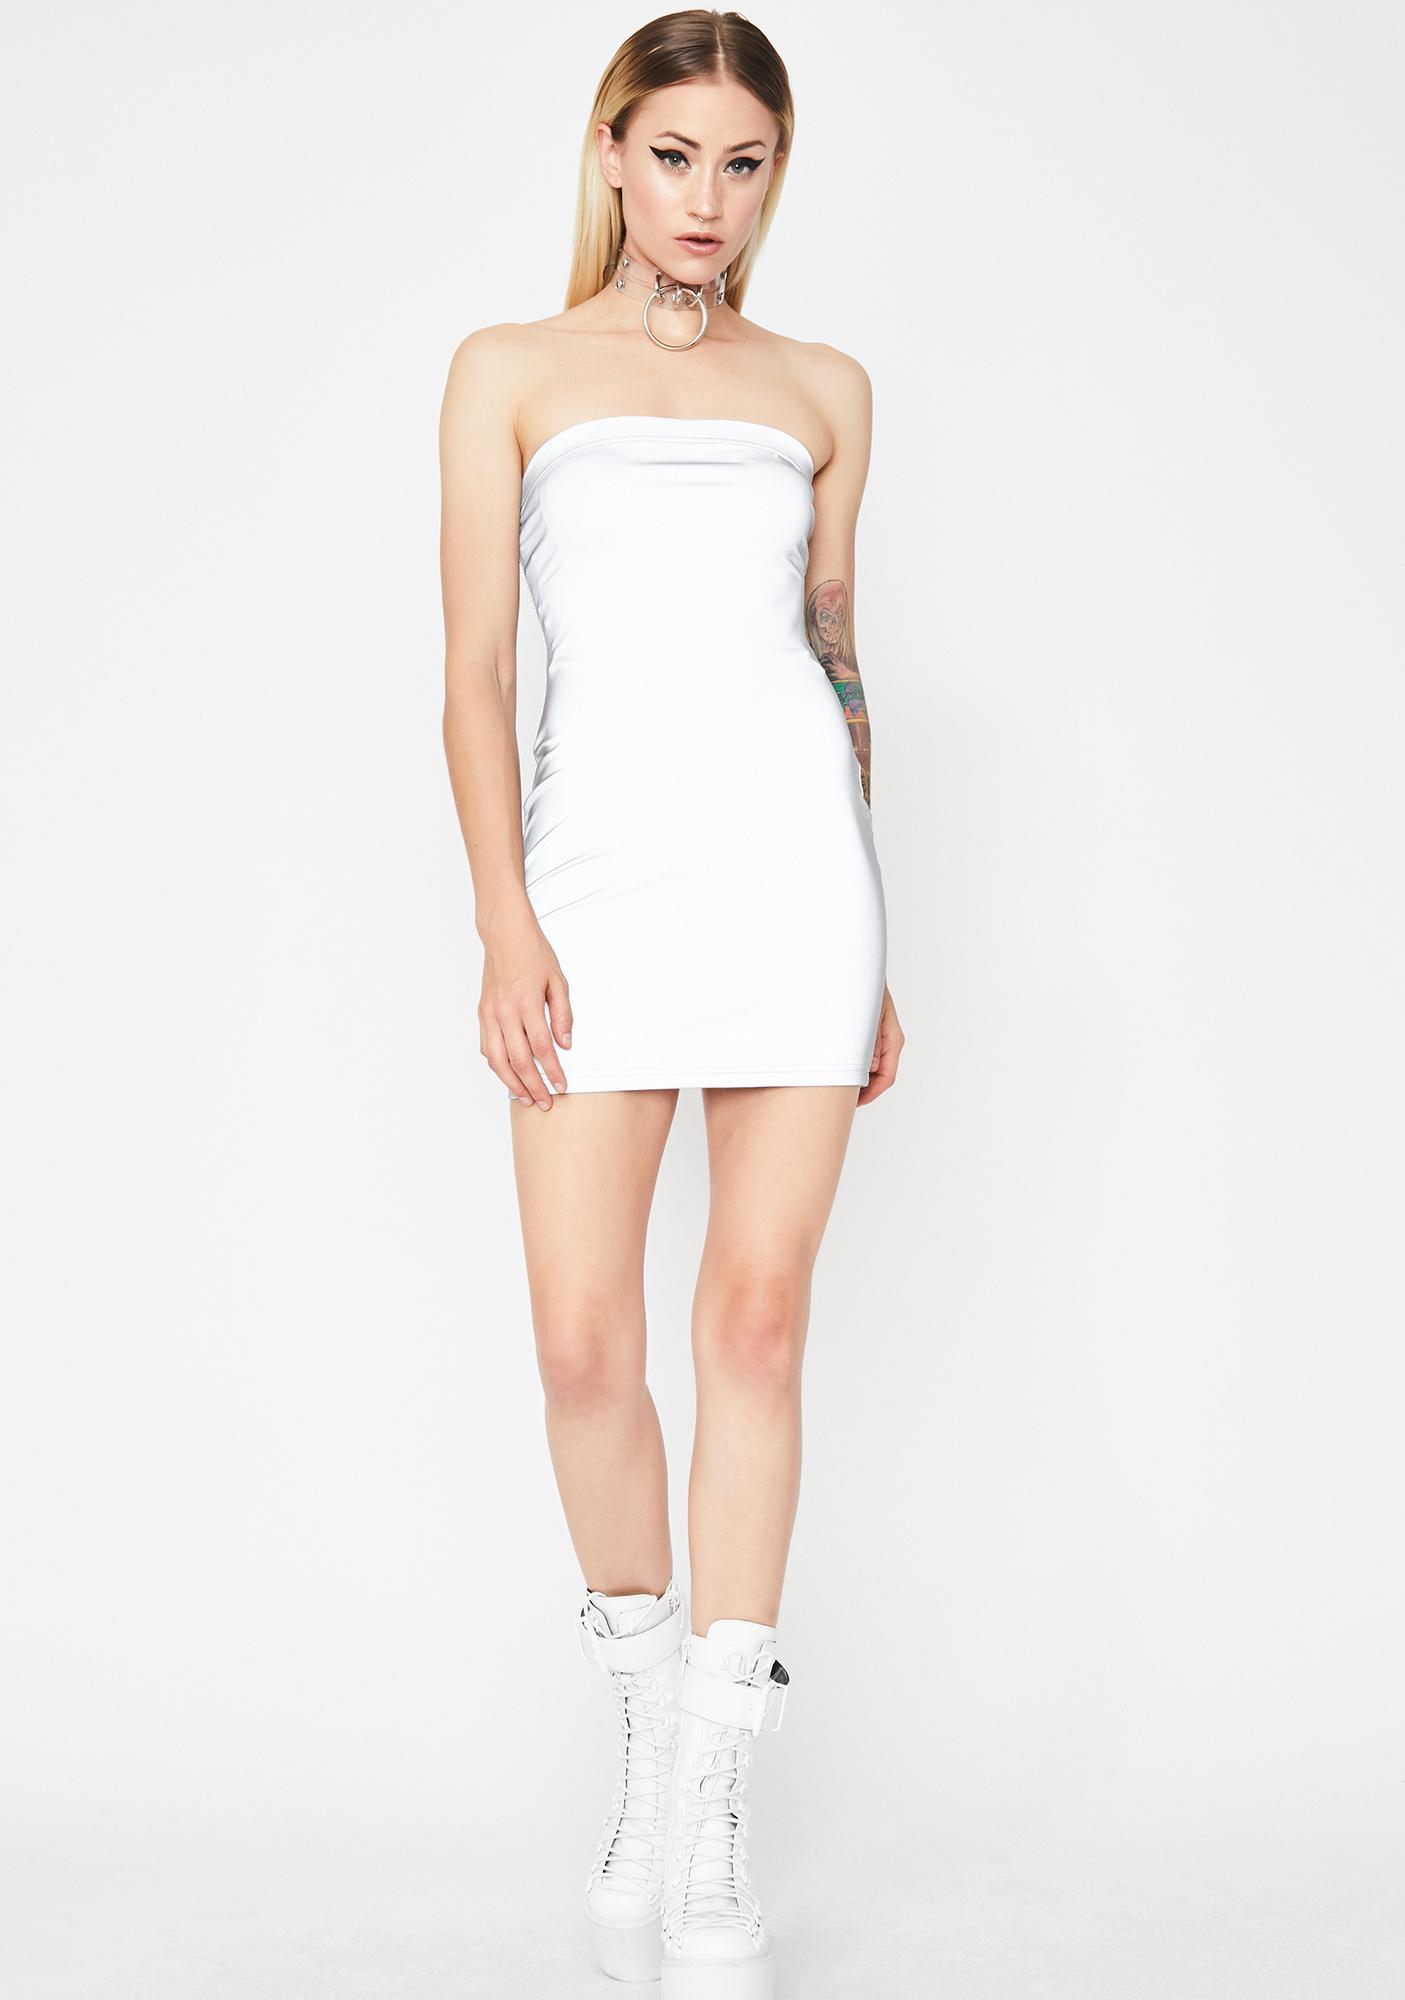 Power Surge Reflective Dress